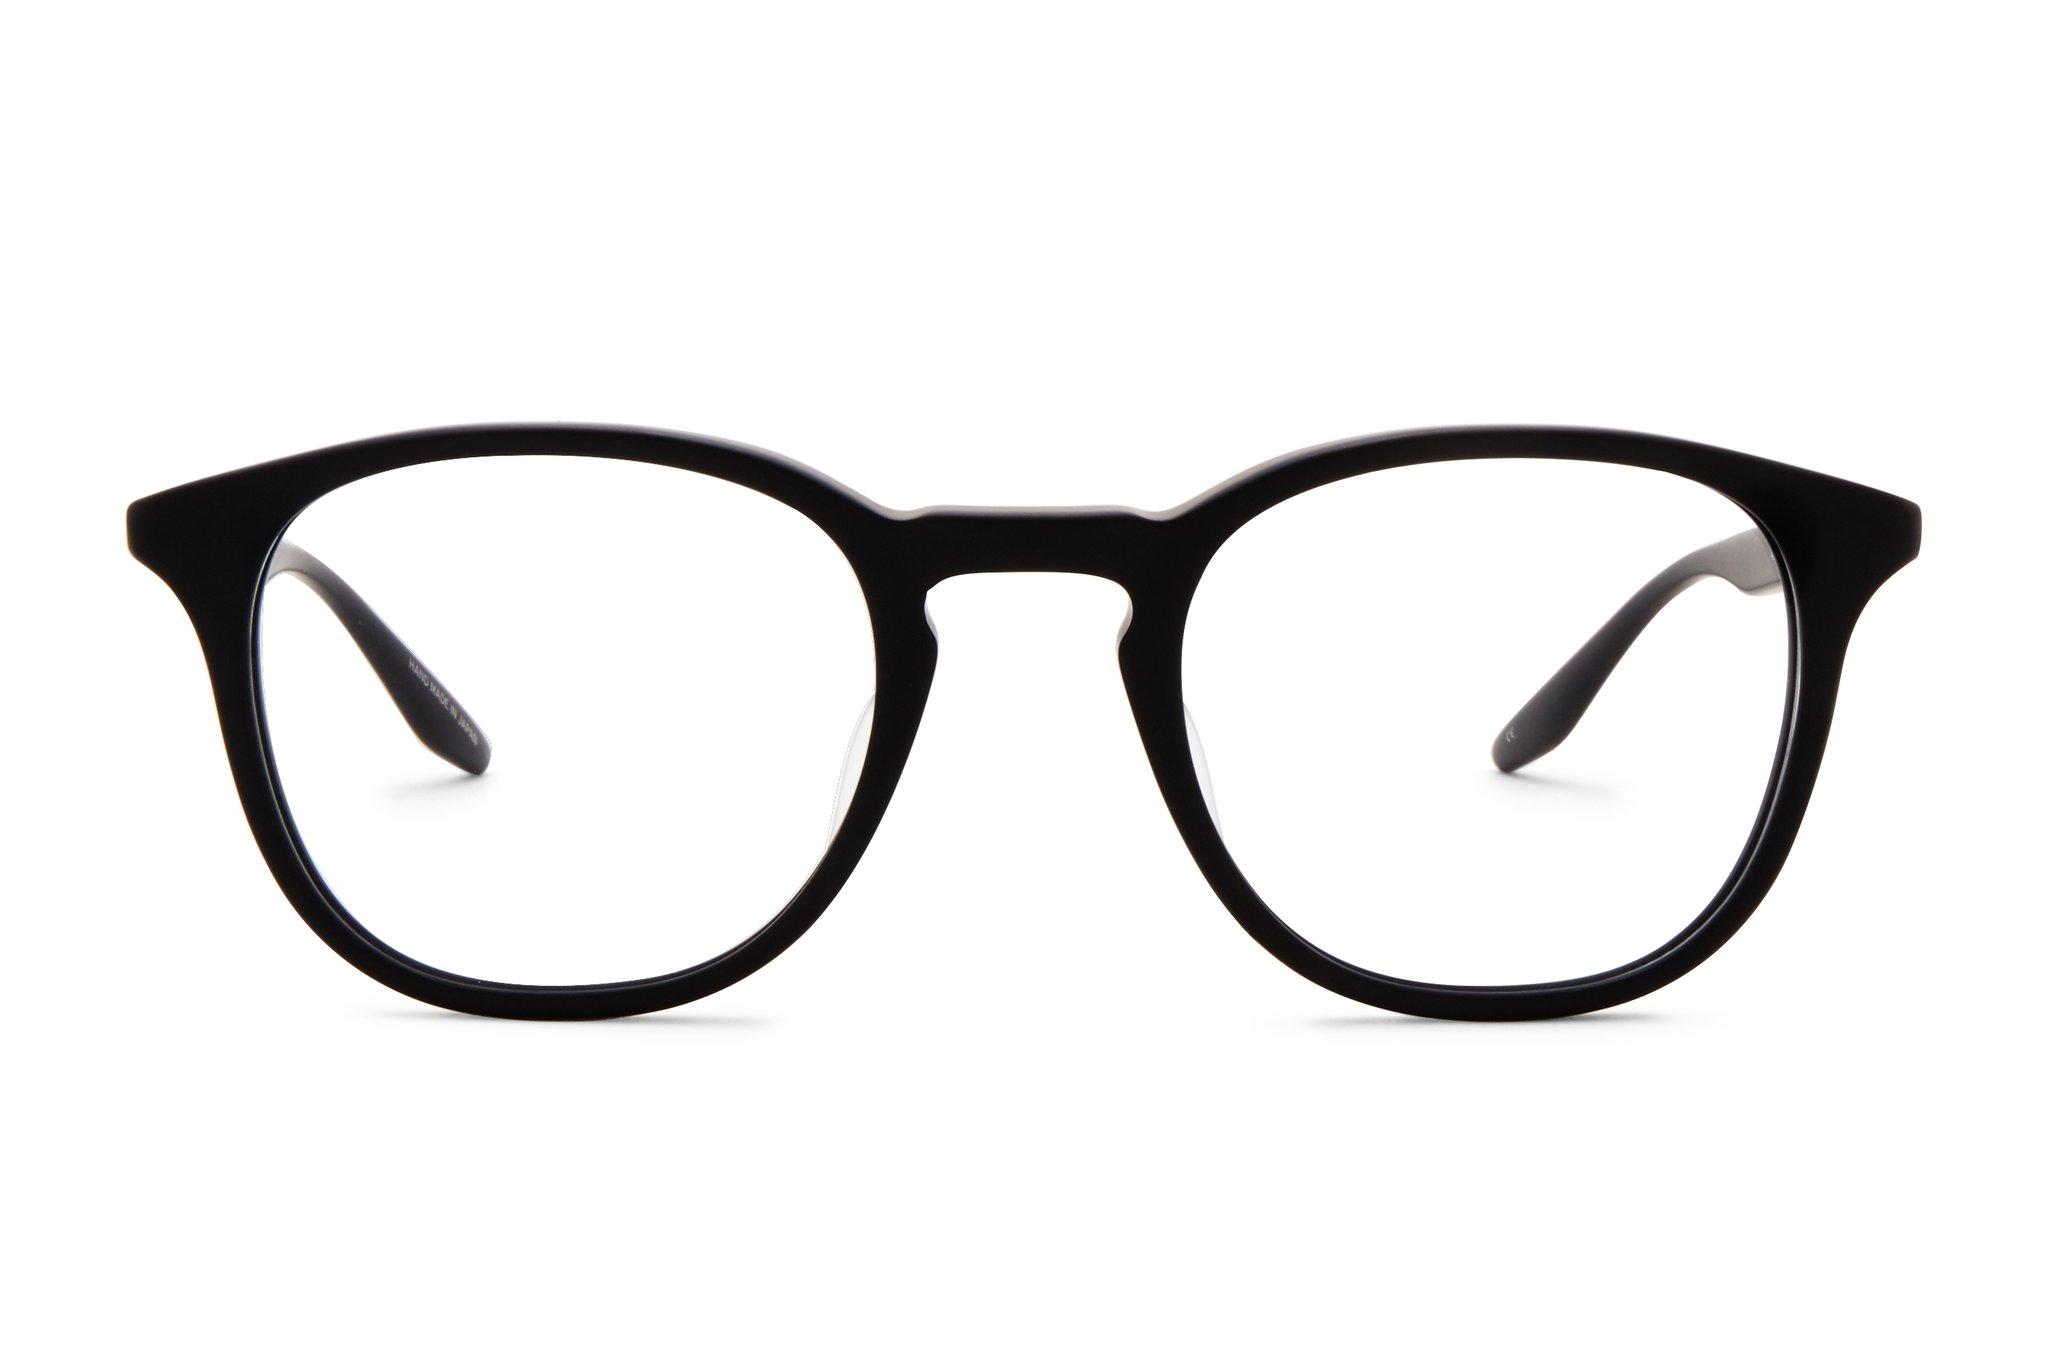 Barton Perreira eyewear Montreal